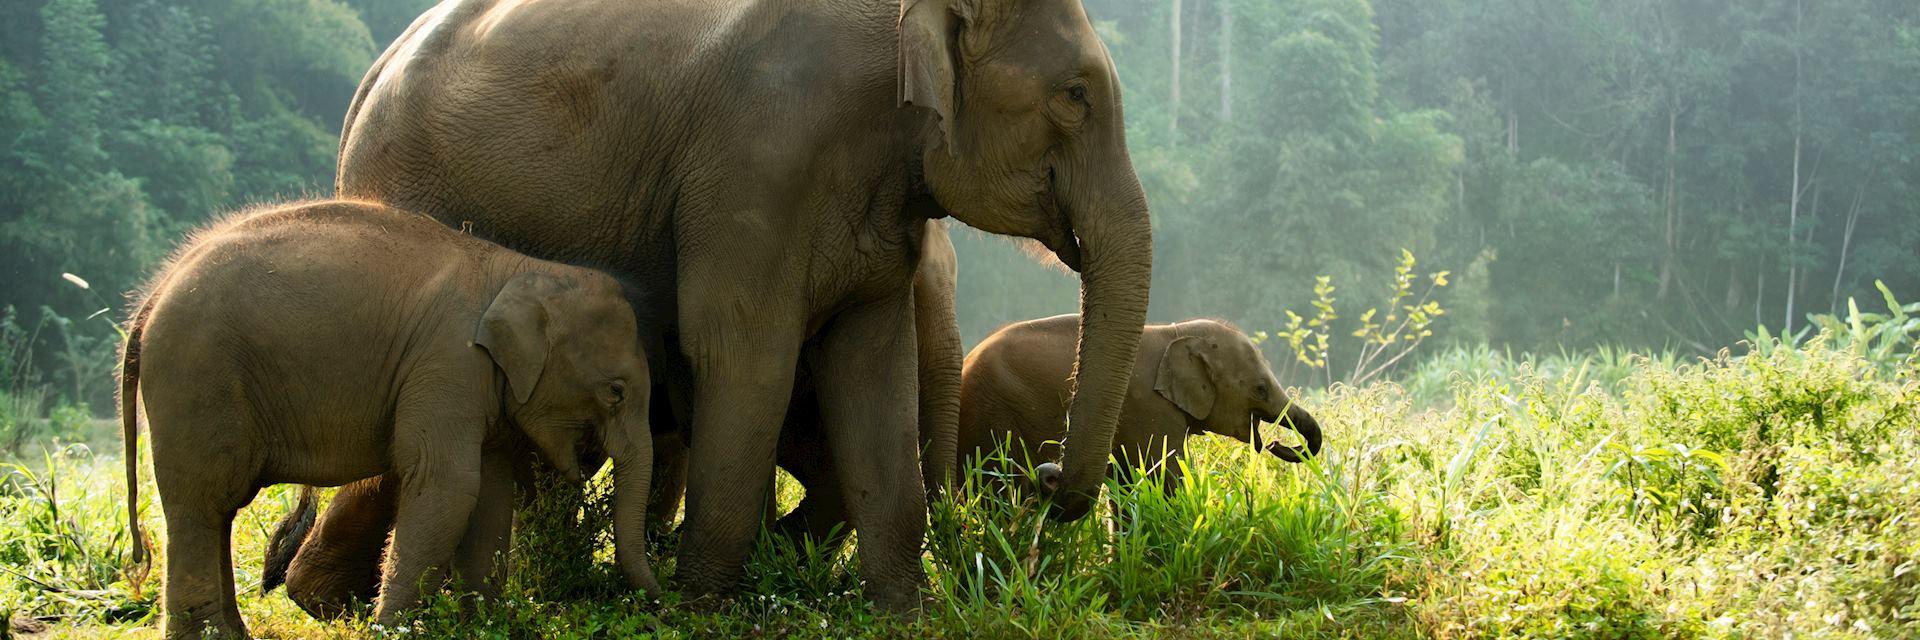 Wild elephant in Vietnam